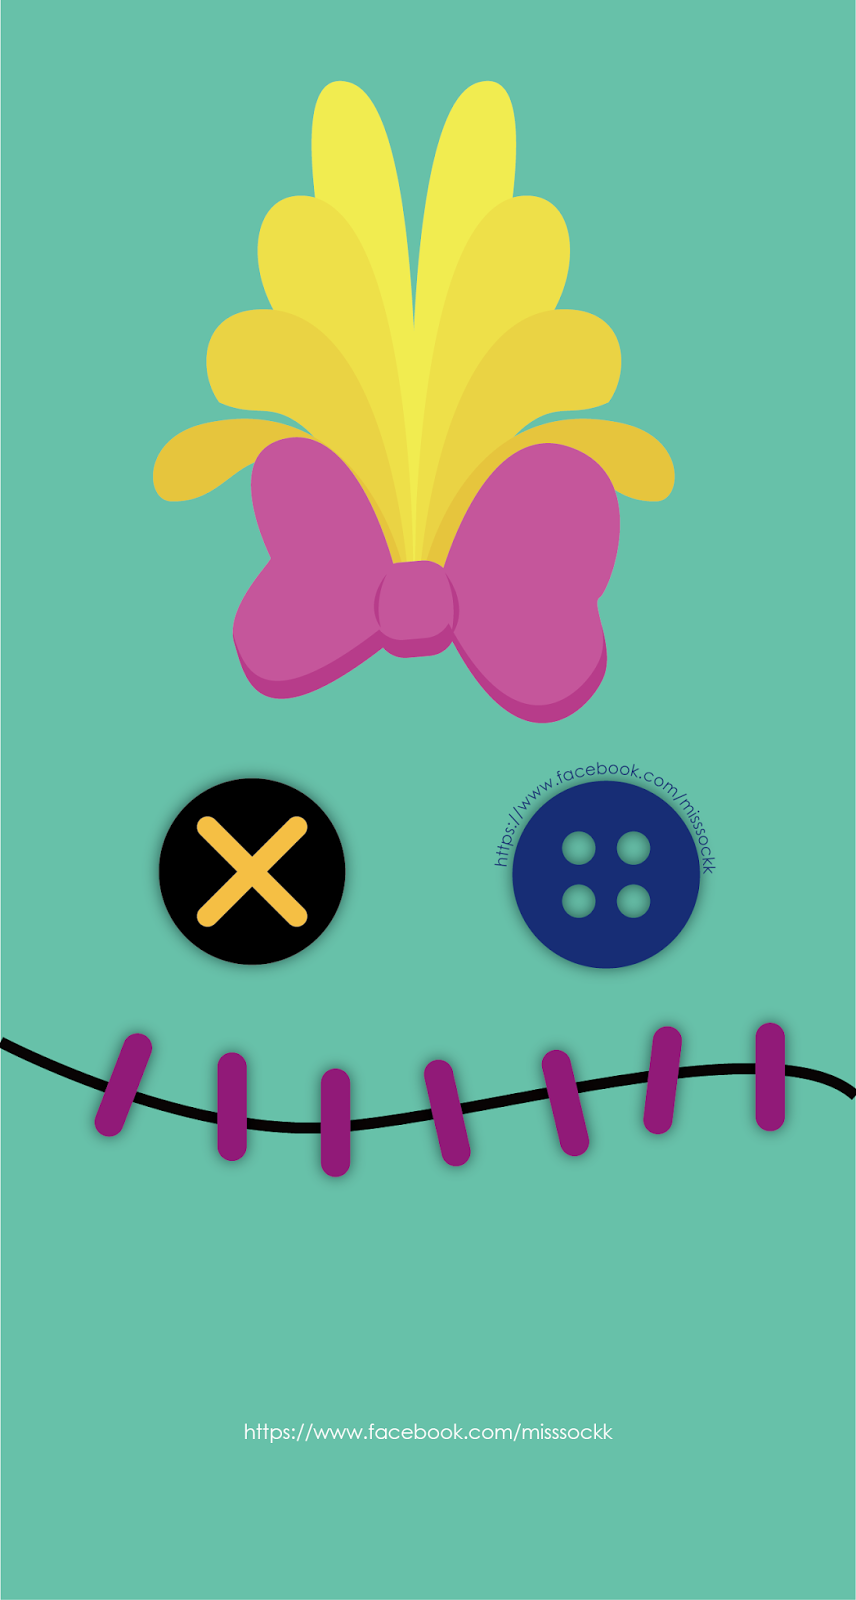 Toy Story Wallpaper Iphone 5 Miss Sockk 蜜絲灑可可 新発売 桌布第四波感謝大會 領取